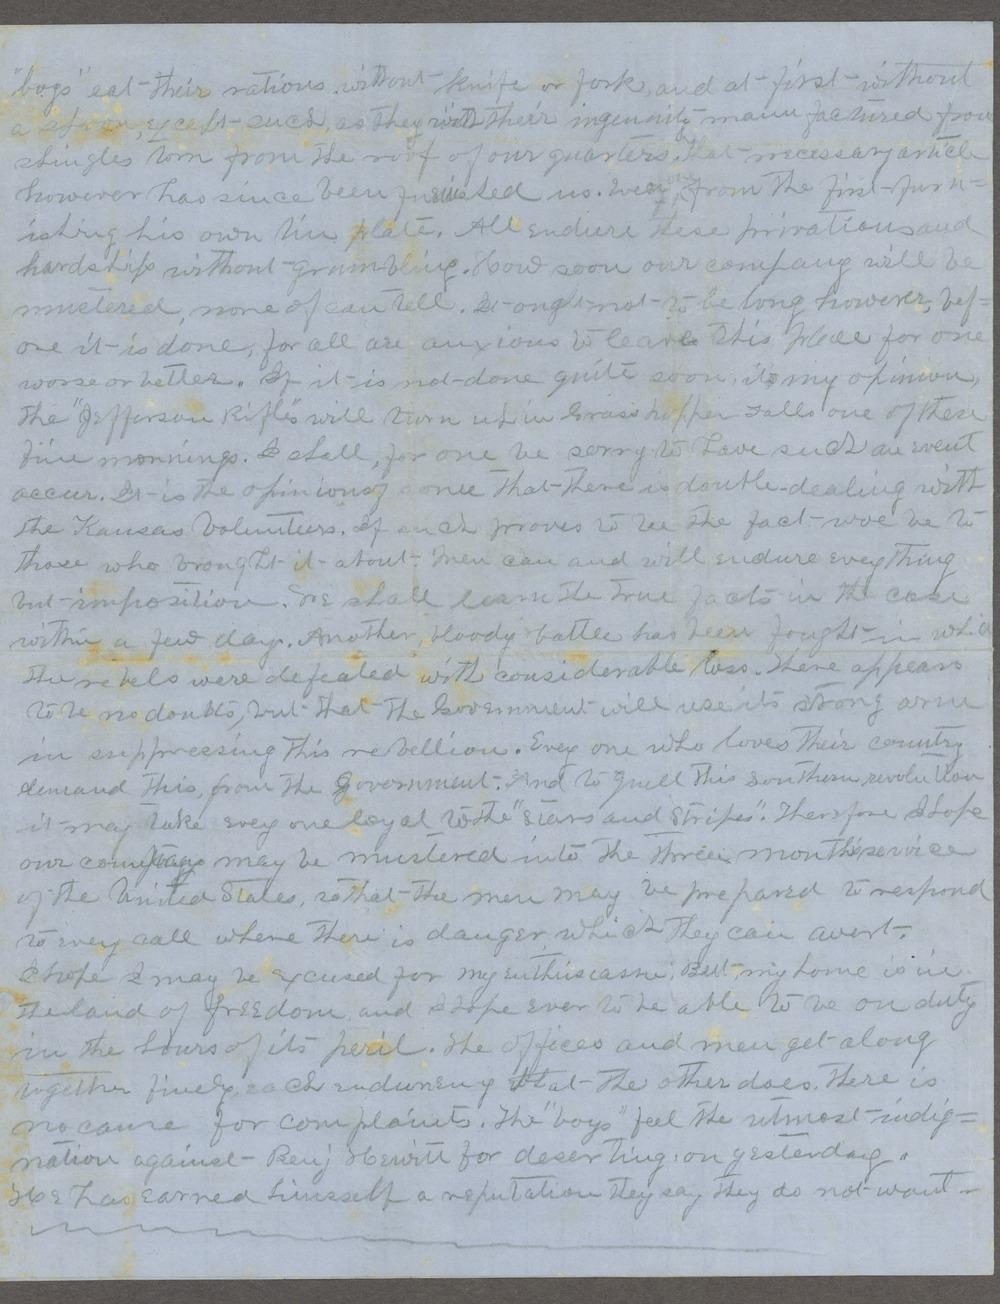 Lewis Stafford to Kate Newland correspondence - 9